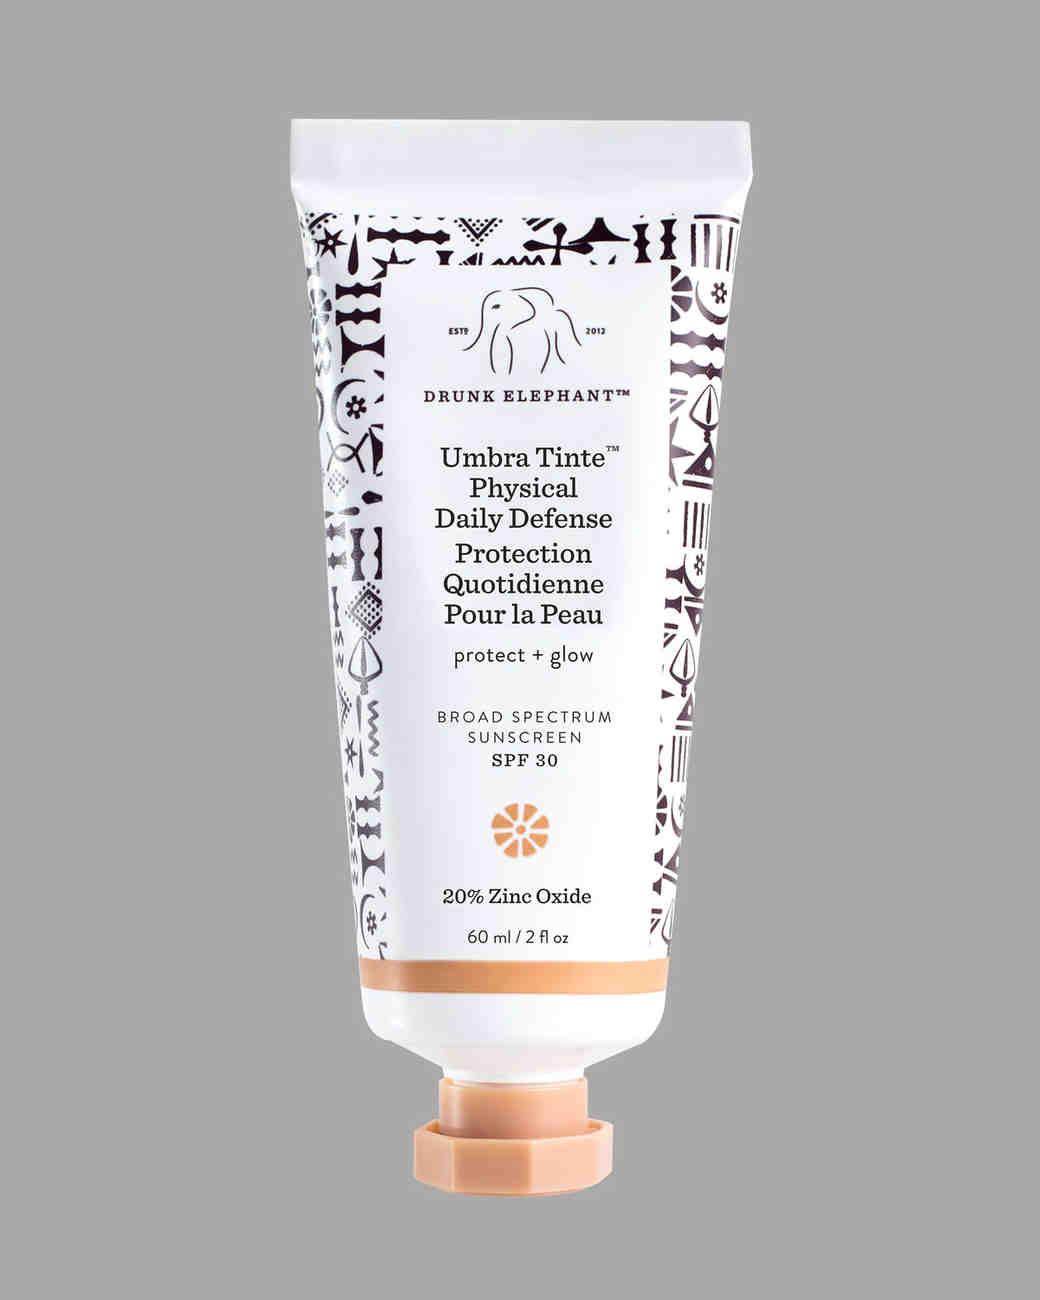 Drunk Elephant Umbra Tinte Daily Defense Sunscreen